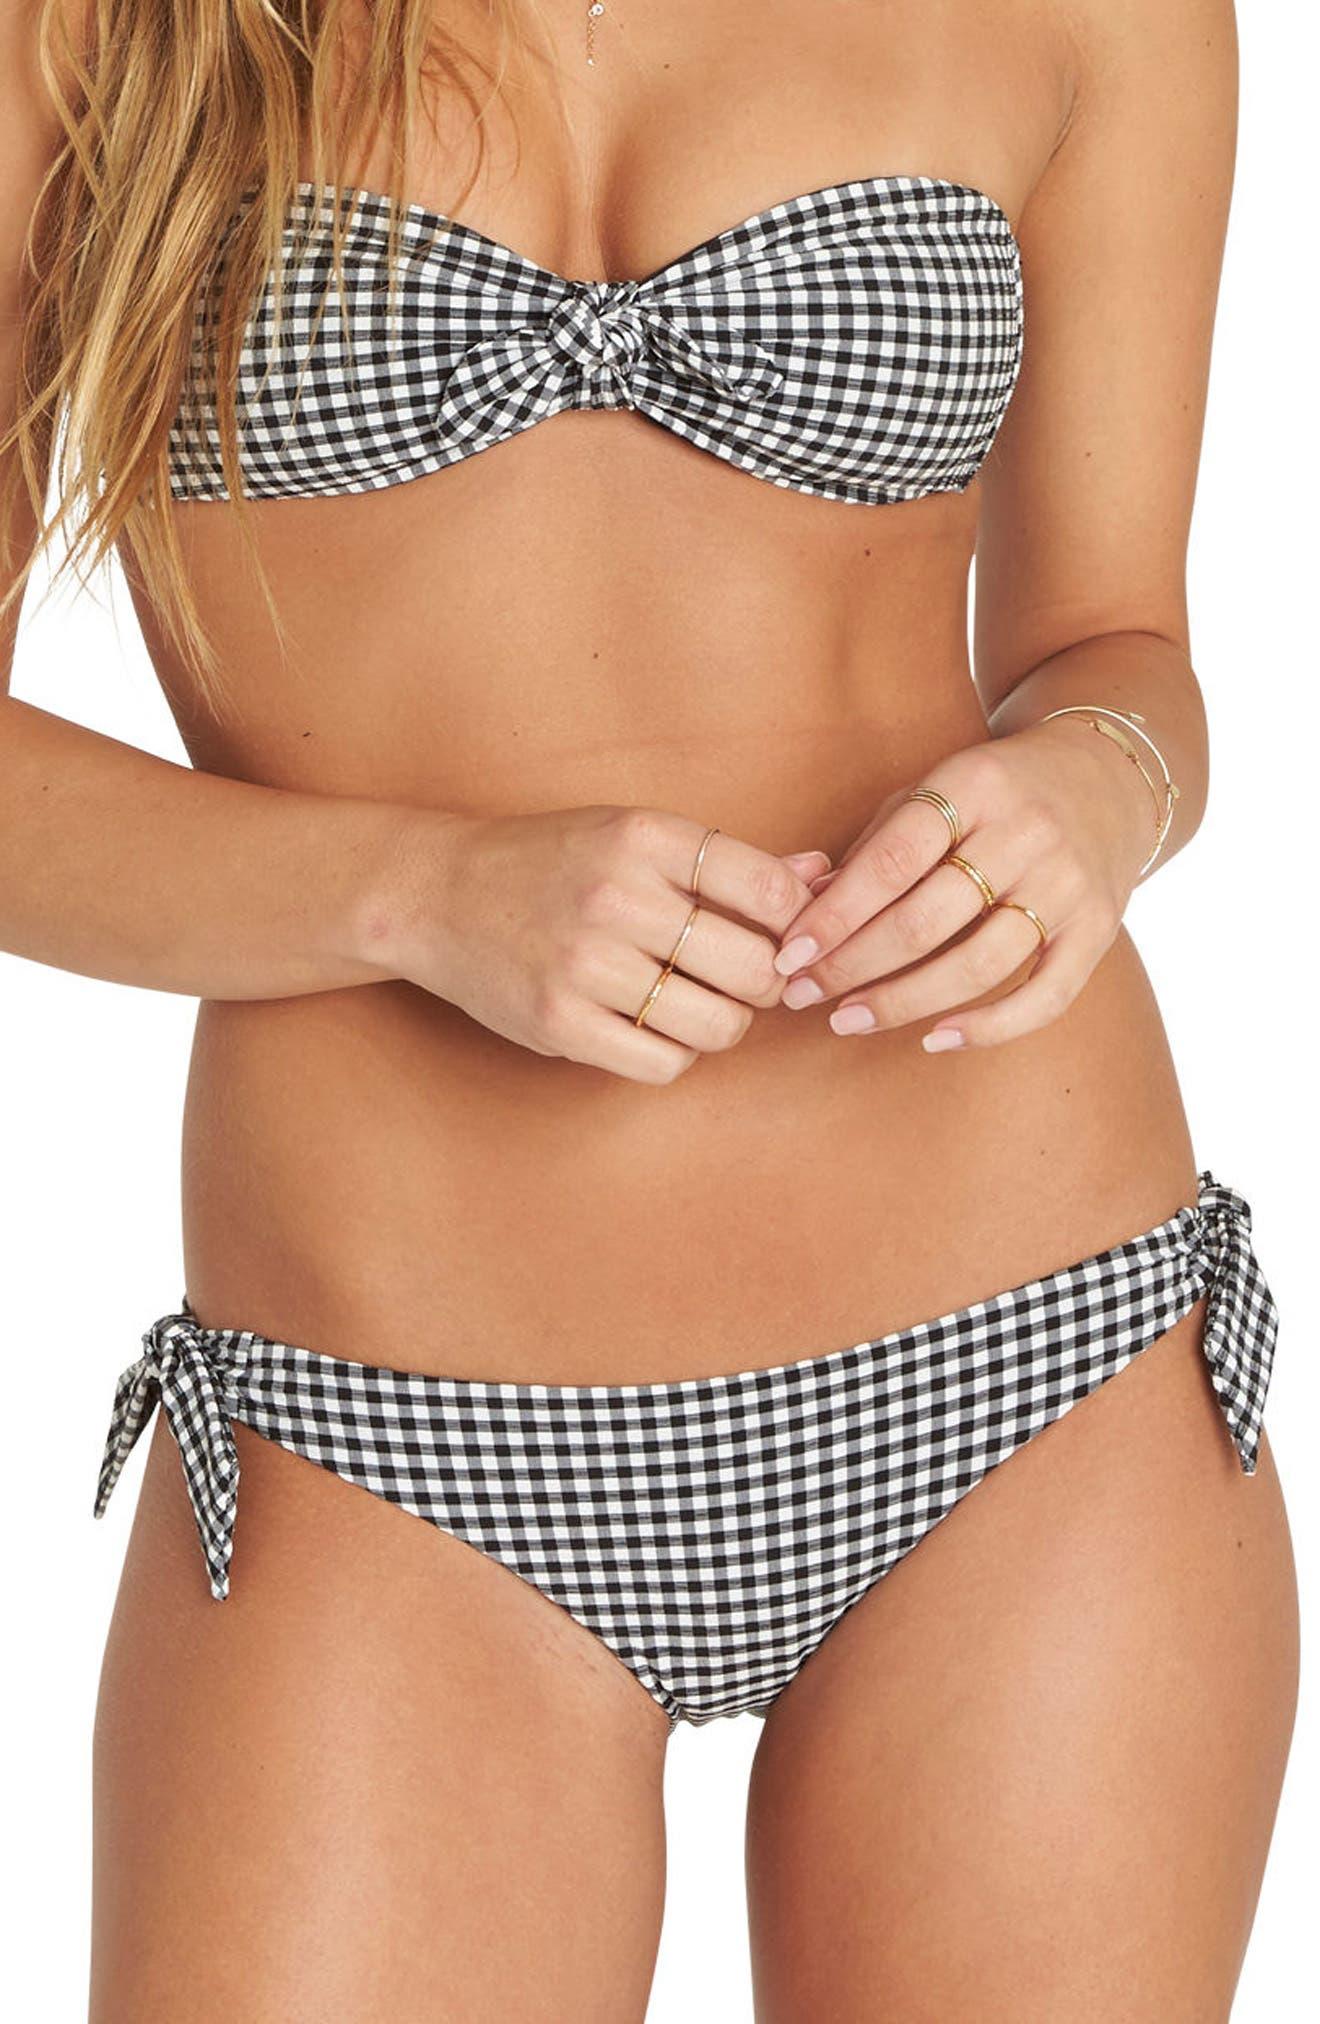 BILLABONG Surf Check Tropic Bikini Bottoms, Main, color, 012